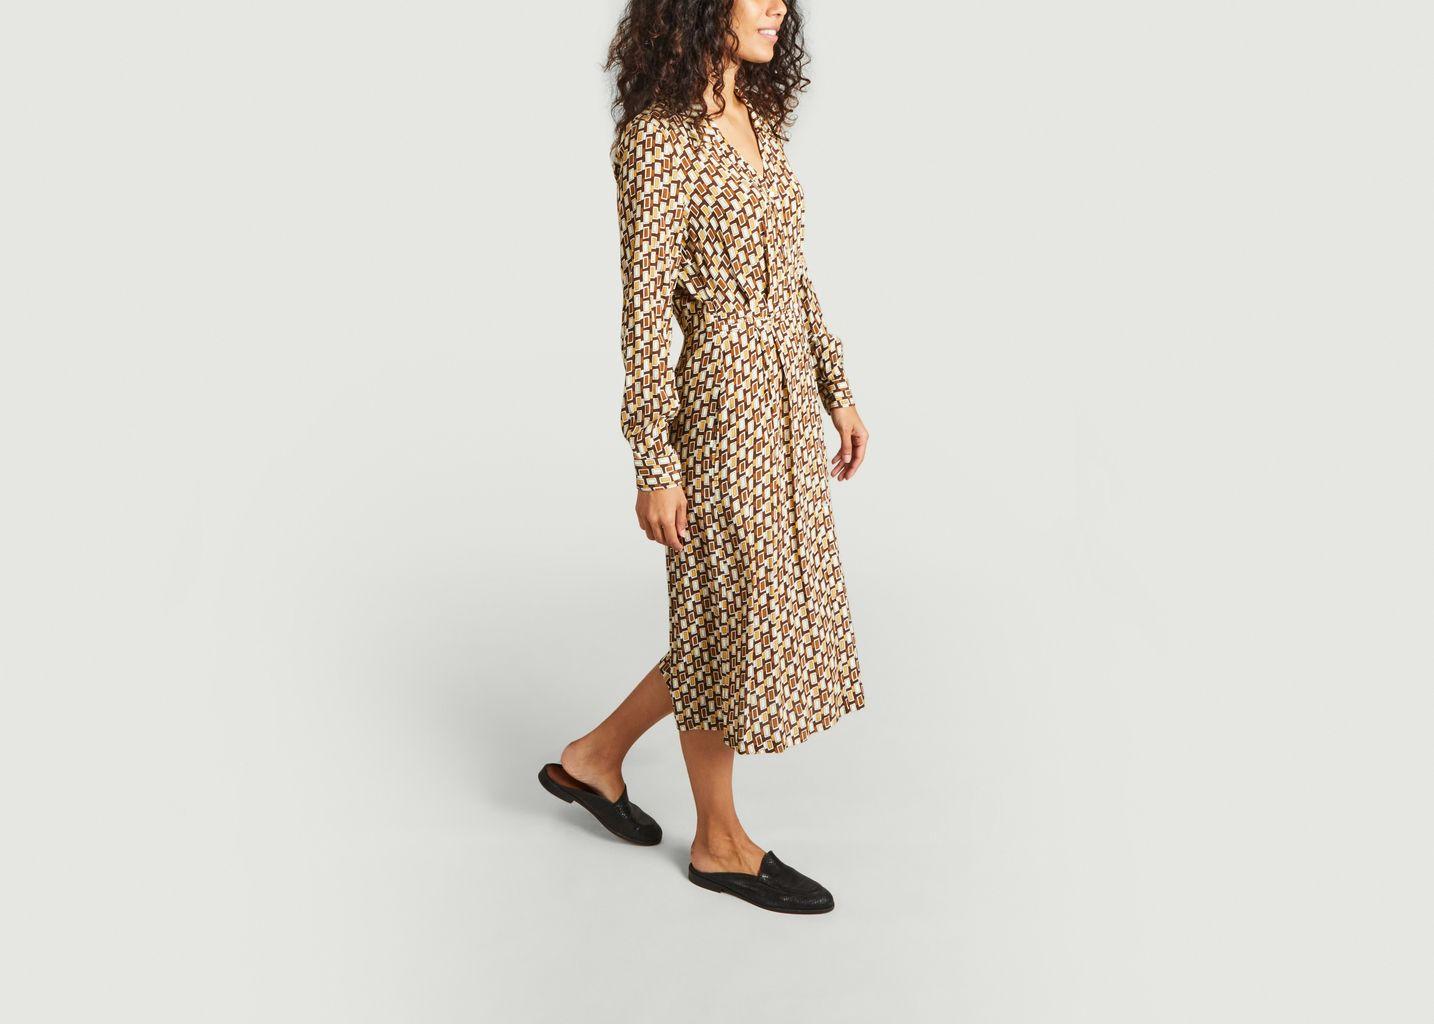 Robe Reciproque - La Petite Française